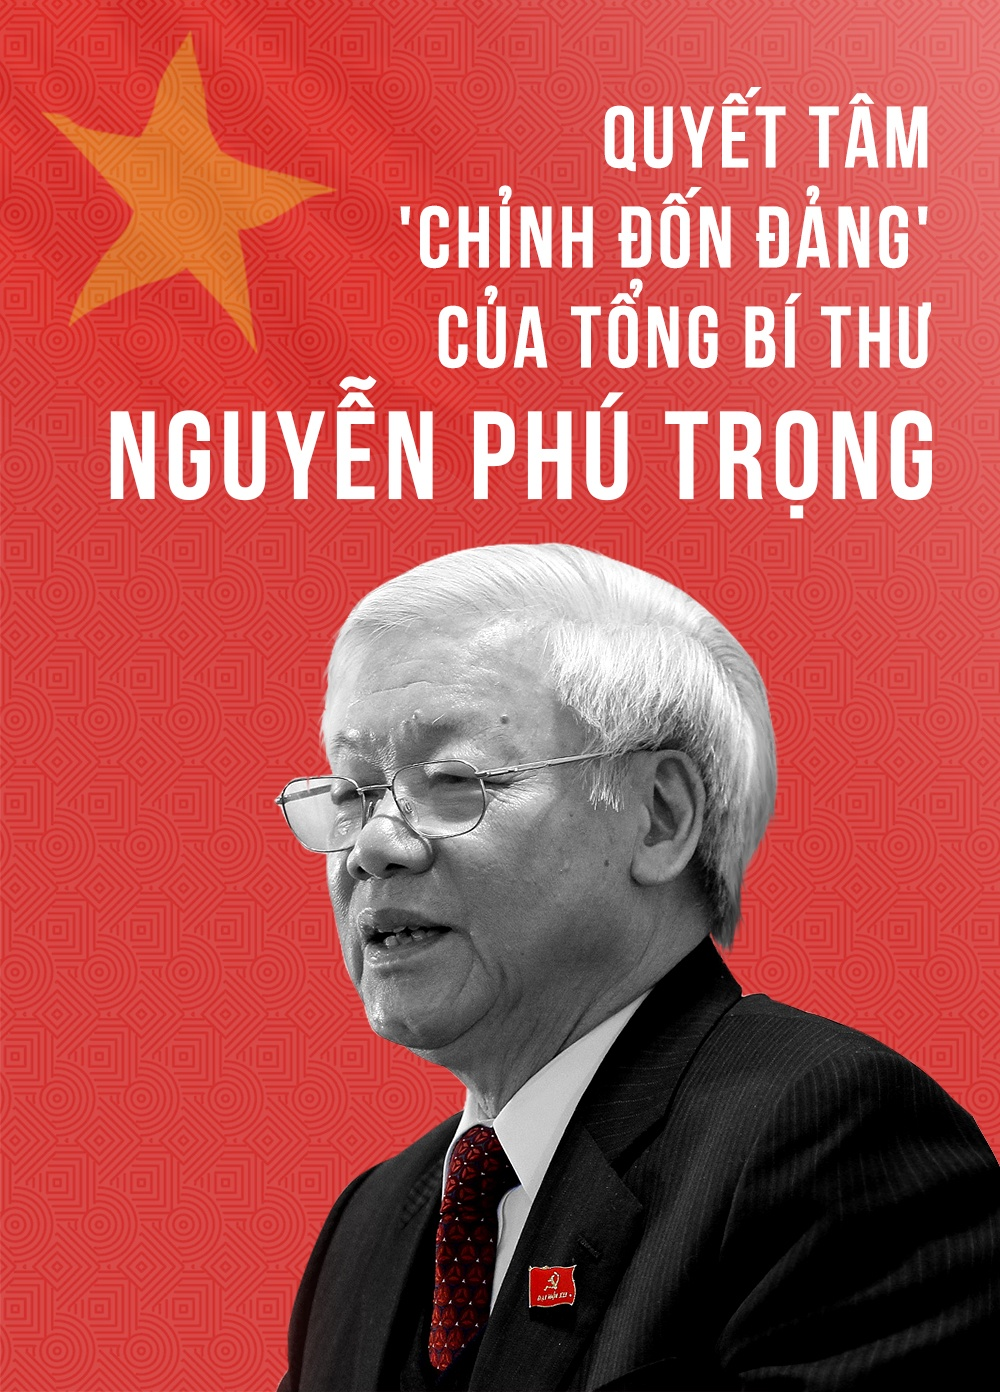 Quyet tam 'chinh don Dang' cua Tong bi thu Nguyen Phu Trong hinh anh 1